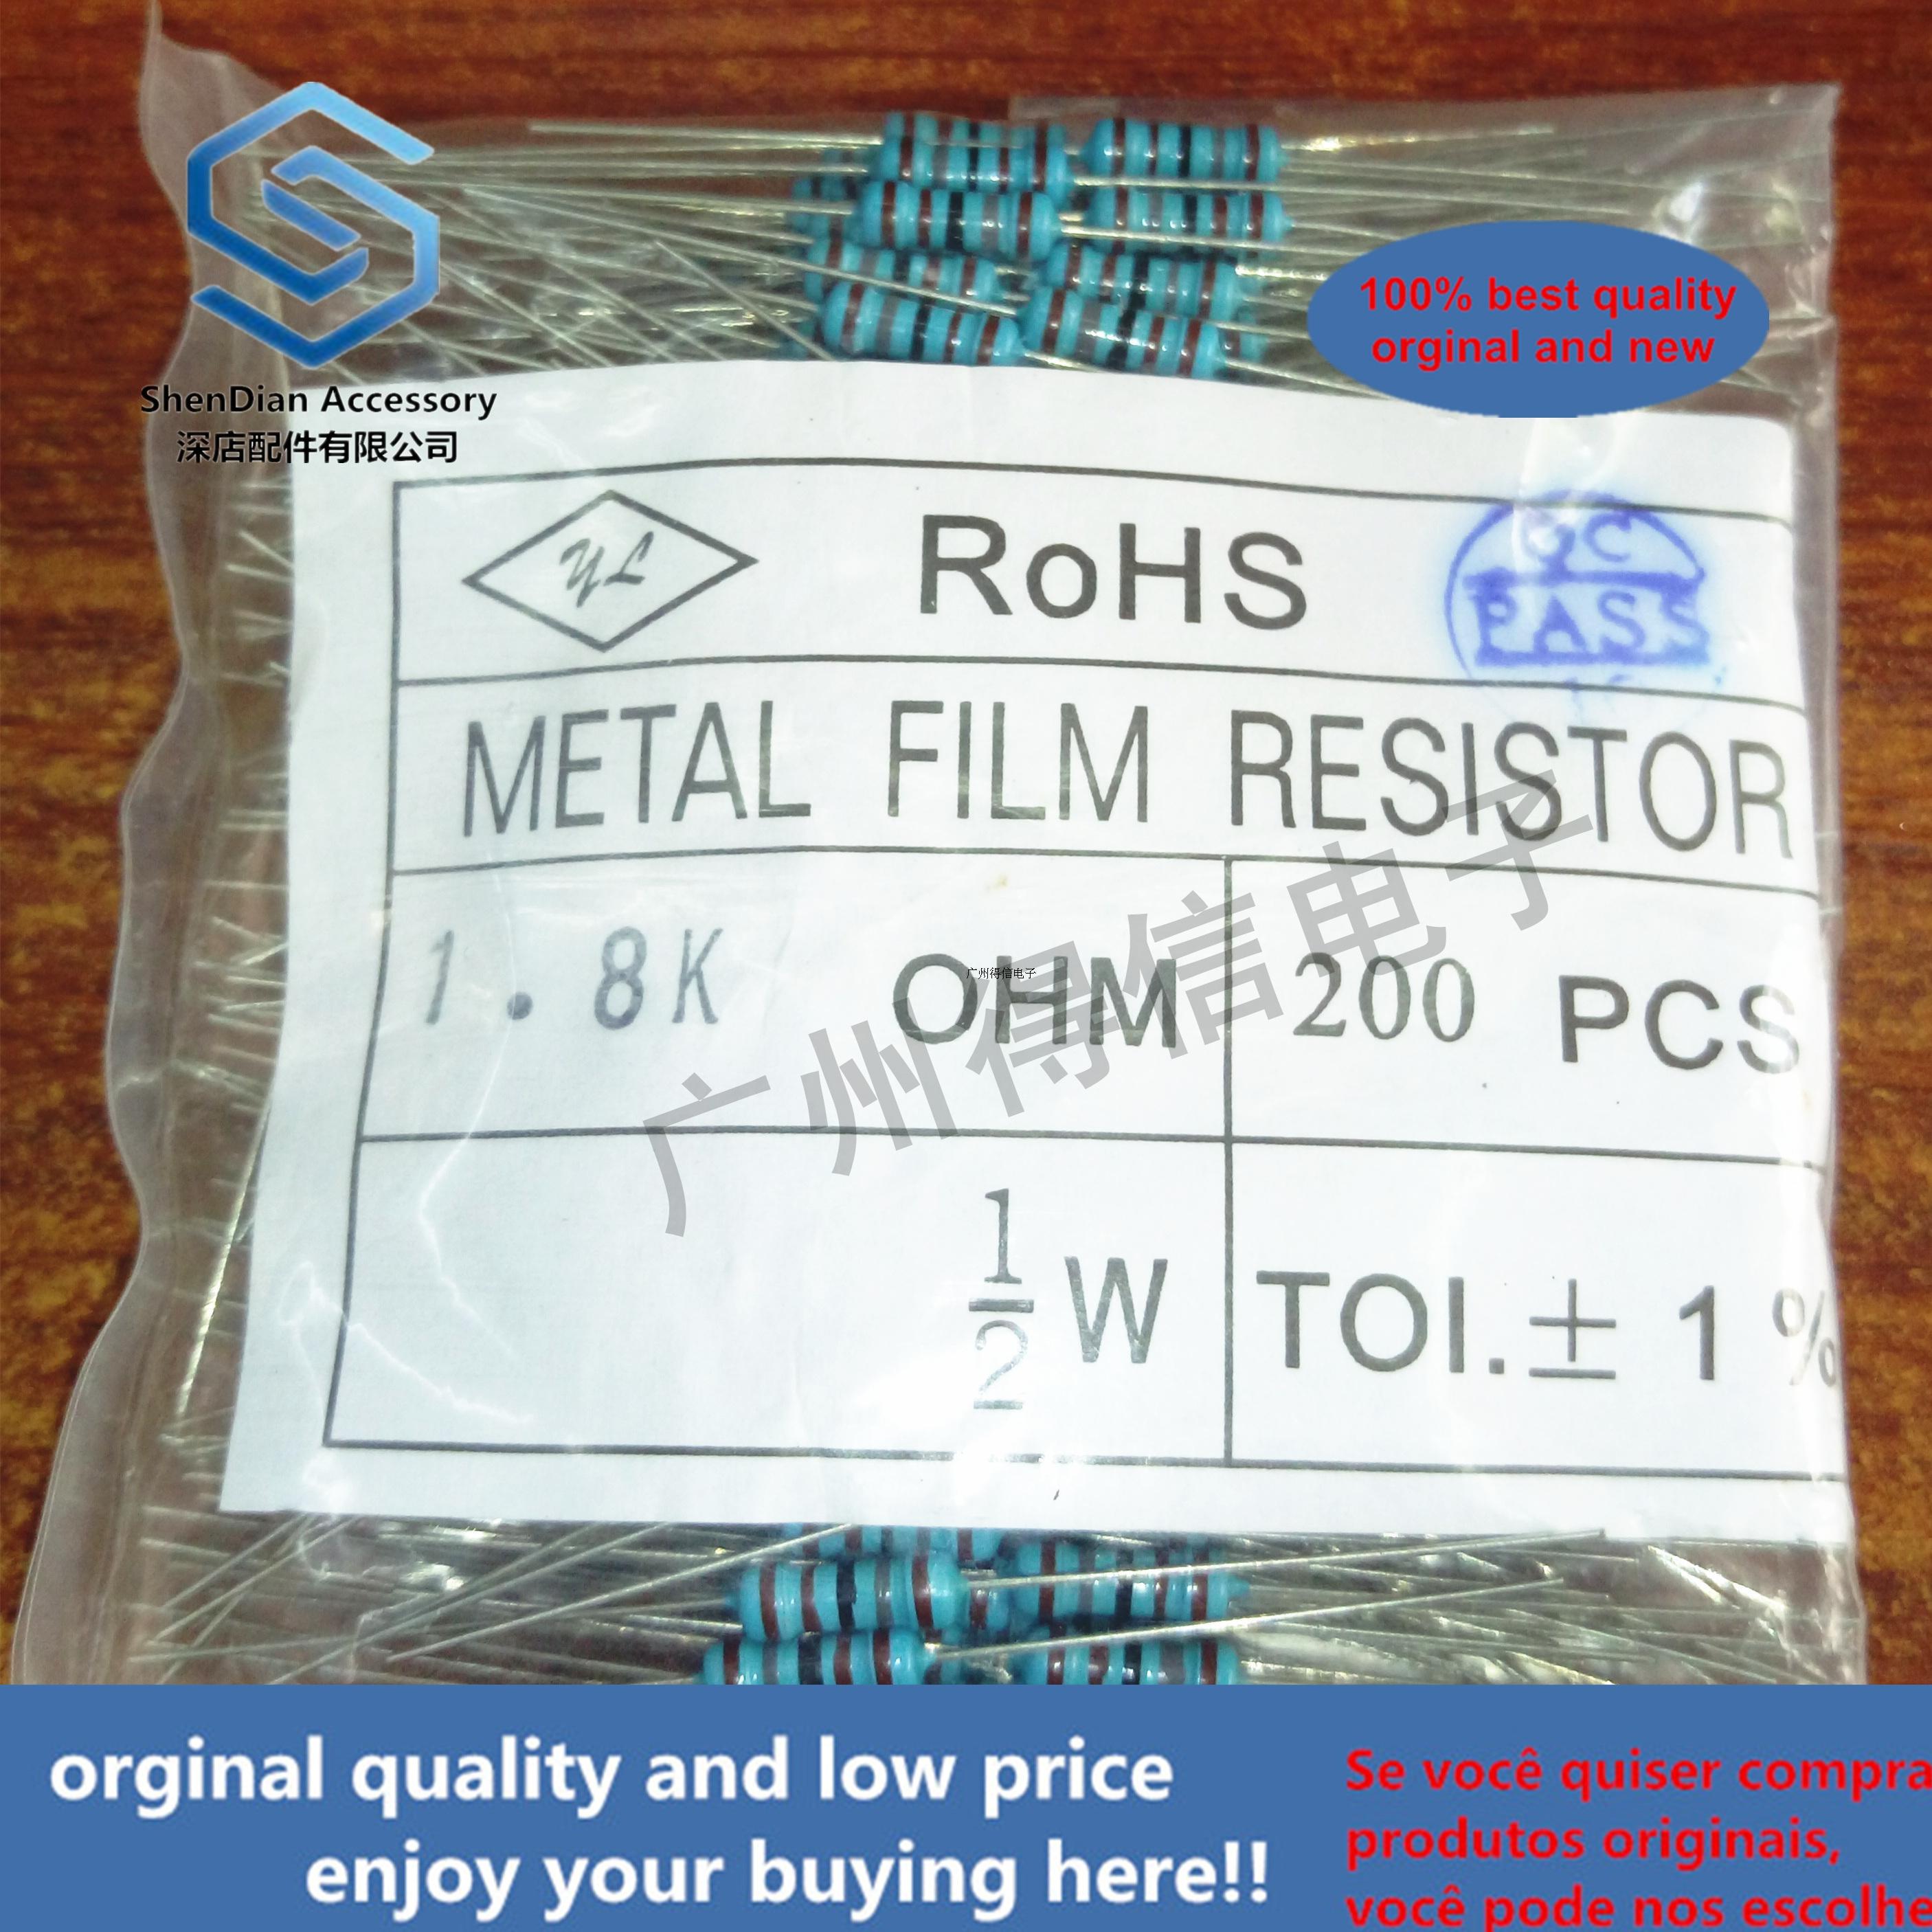 200pcs 1 / 2W 2M 1% Brand New Metal Film Iron Feet Resistor Bag 200 Pcs Per Pack